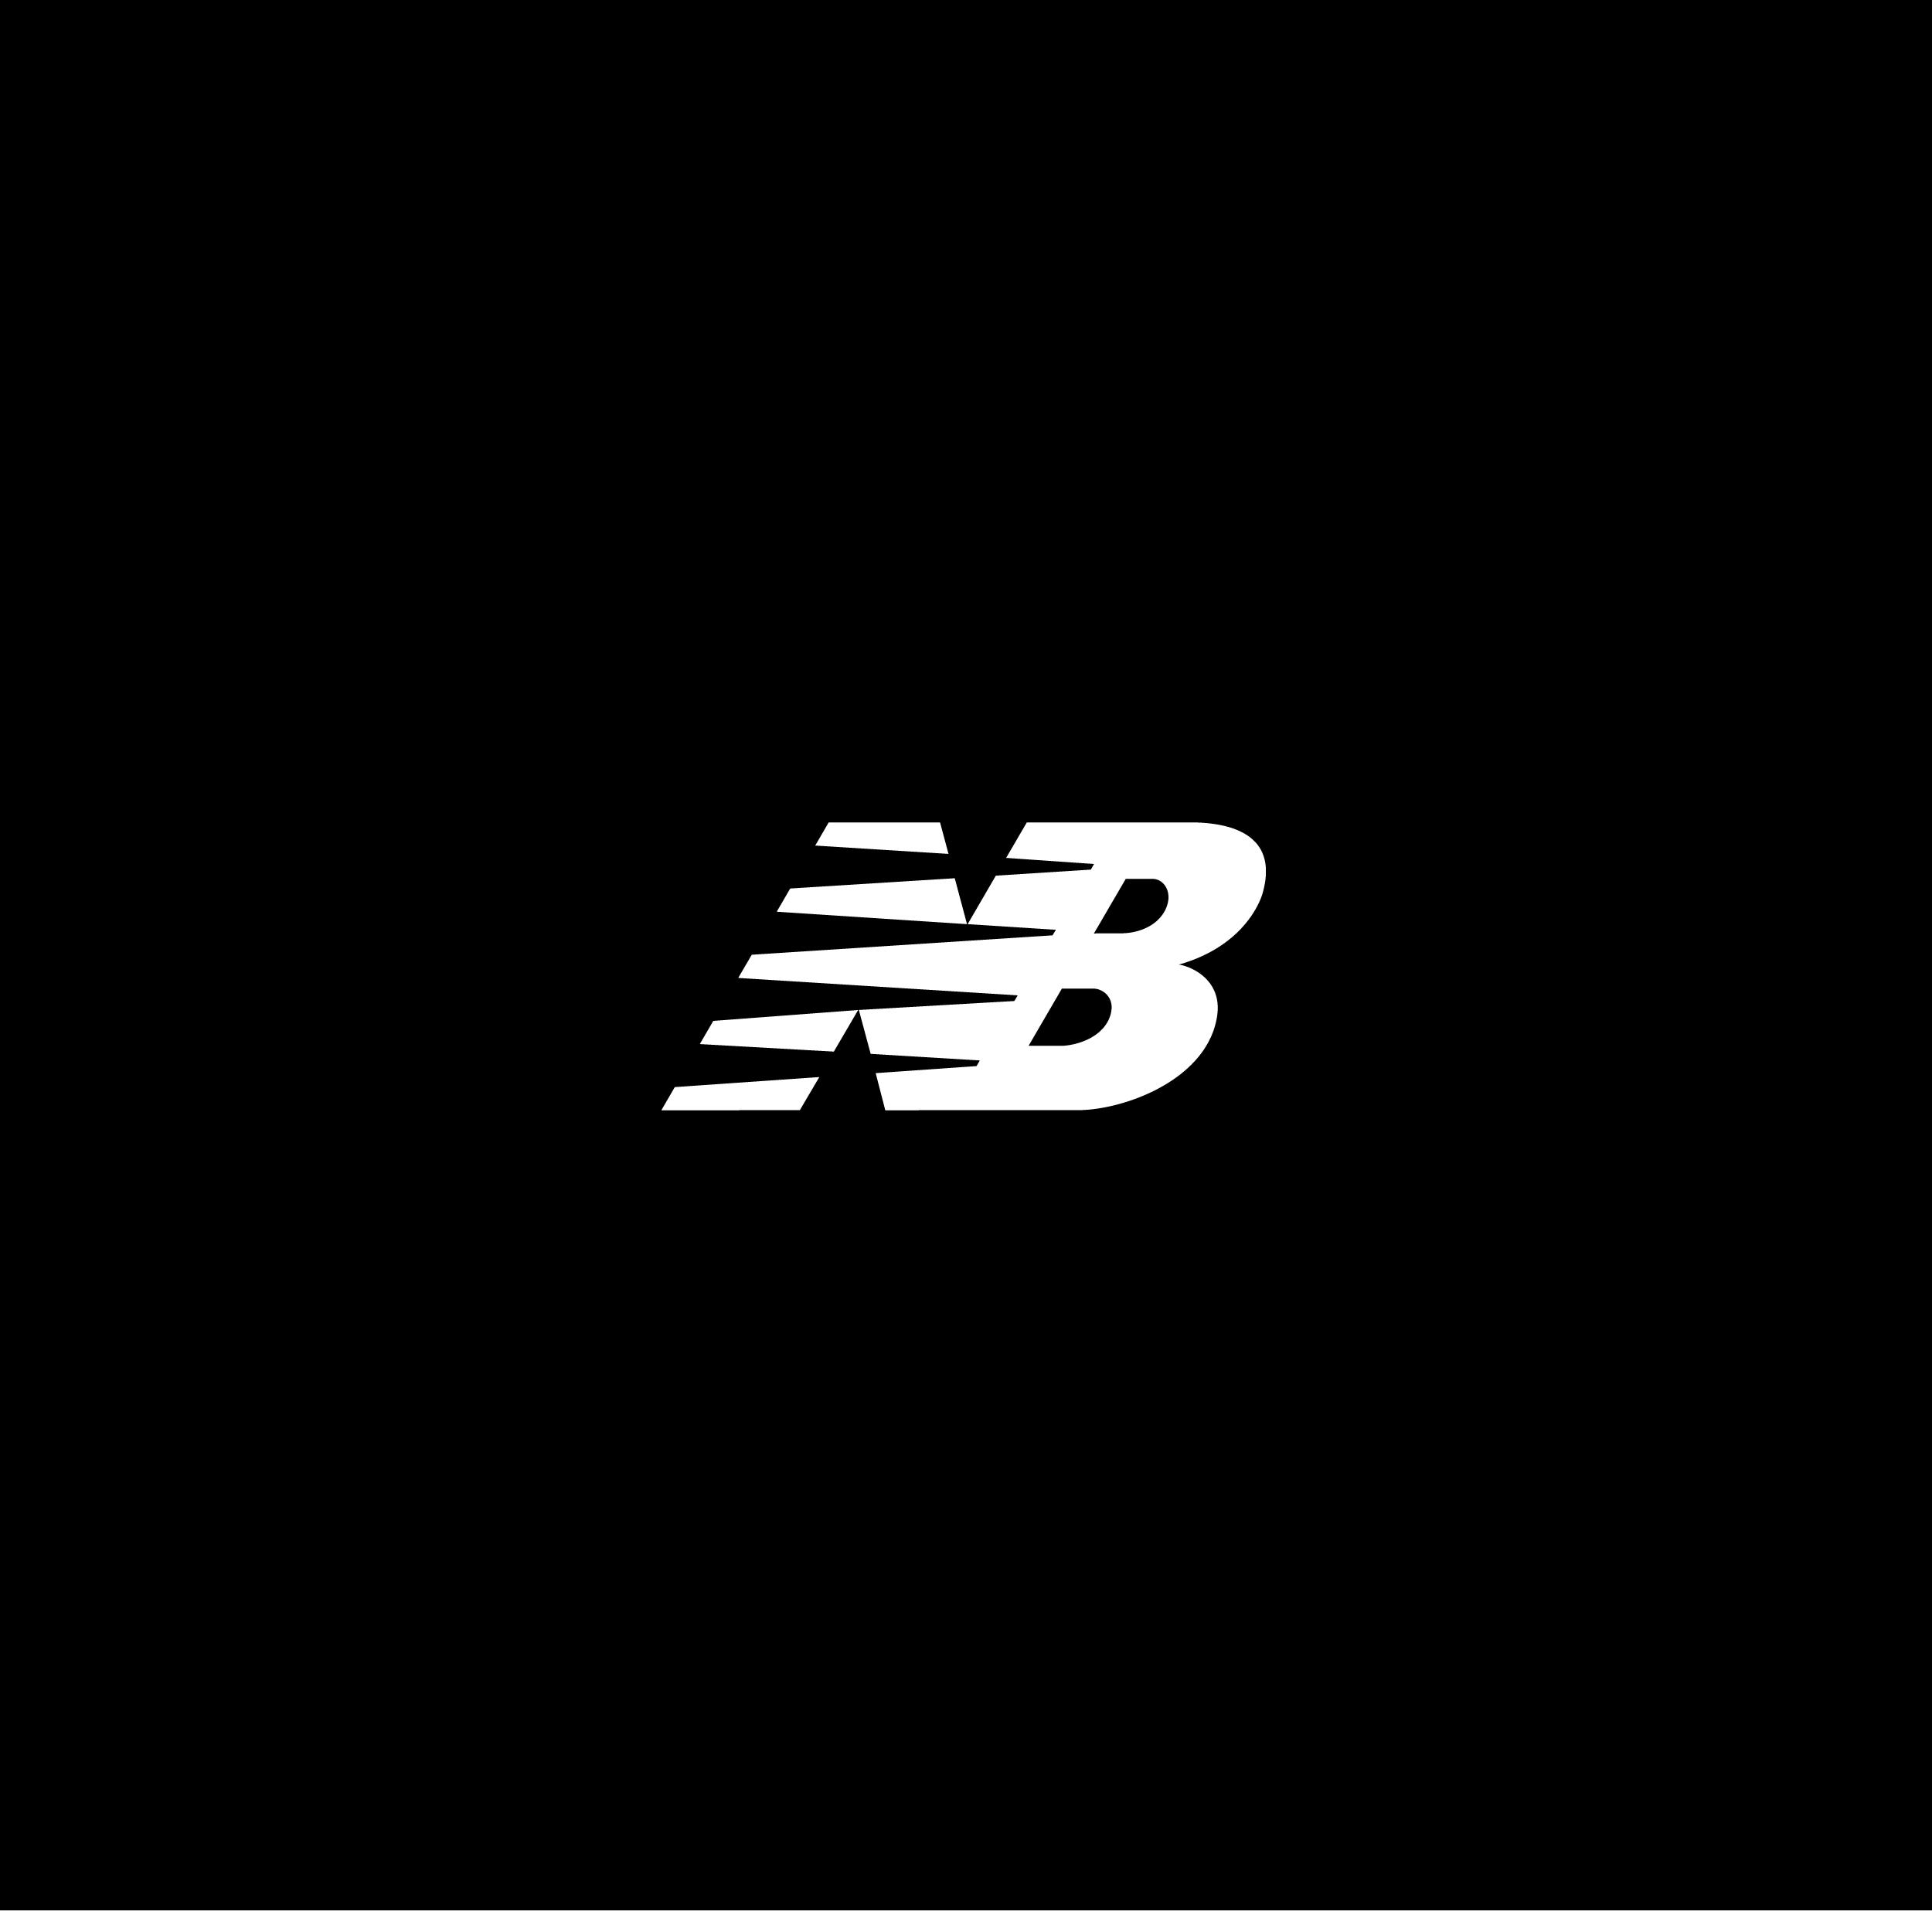 Pin By Kristi Combs On Clothing Company Logos Logo Quotes New Balance Logos